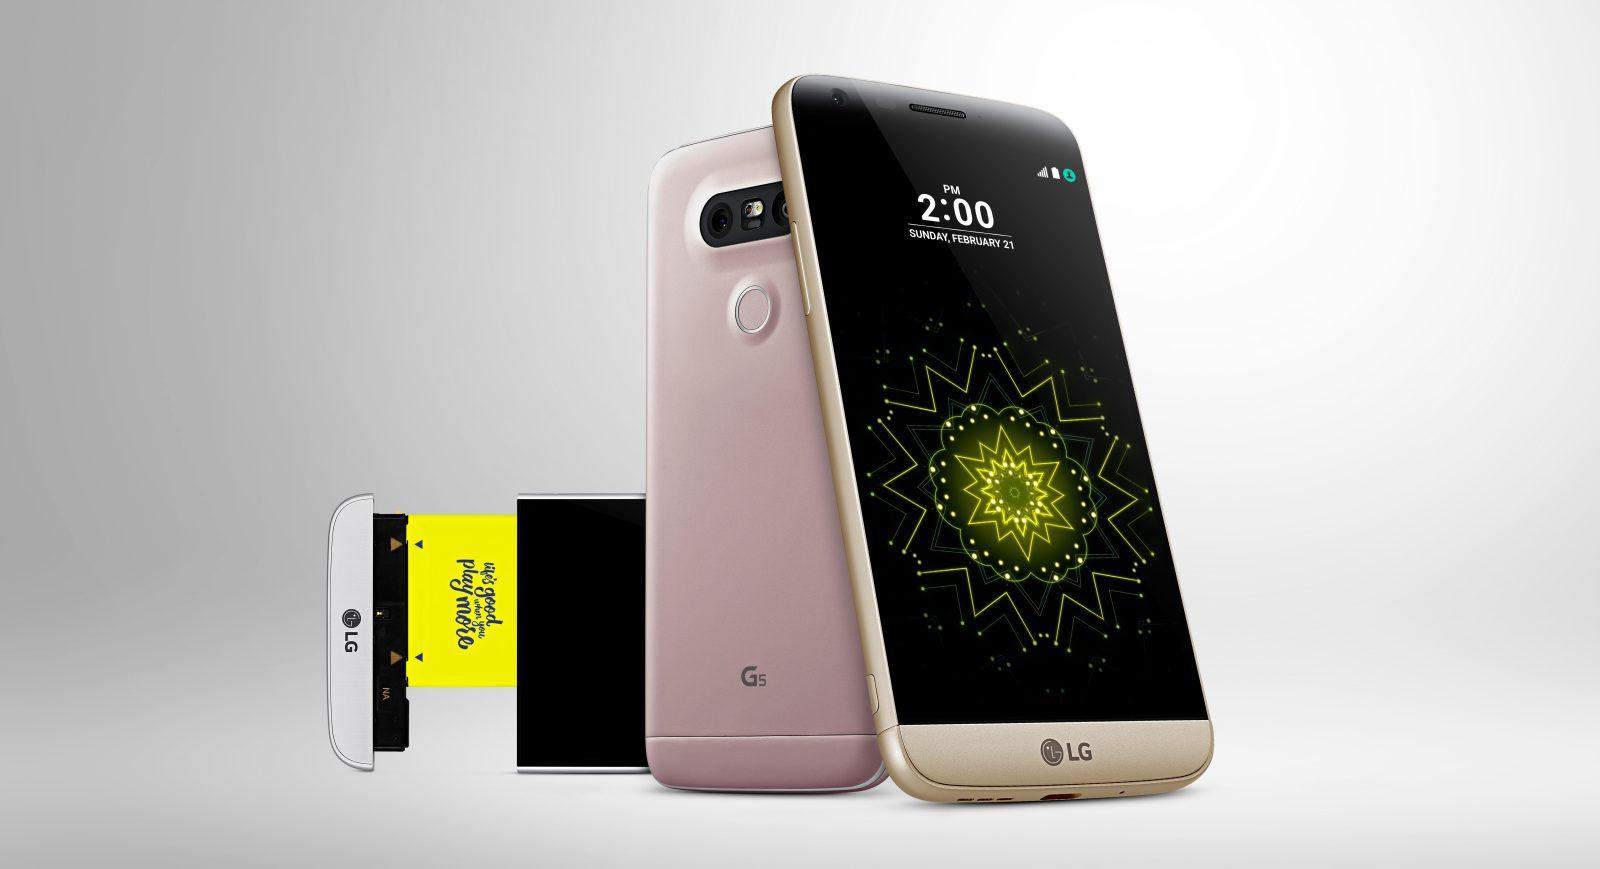 LG G5 Smartphone w/ 32GB flash GSM 4G LTE (factory unlocked